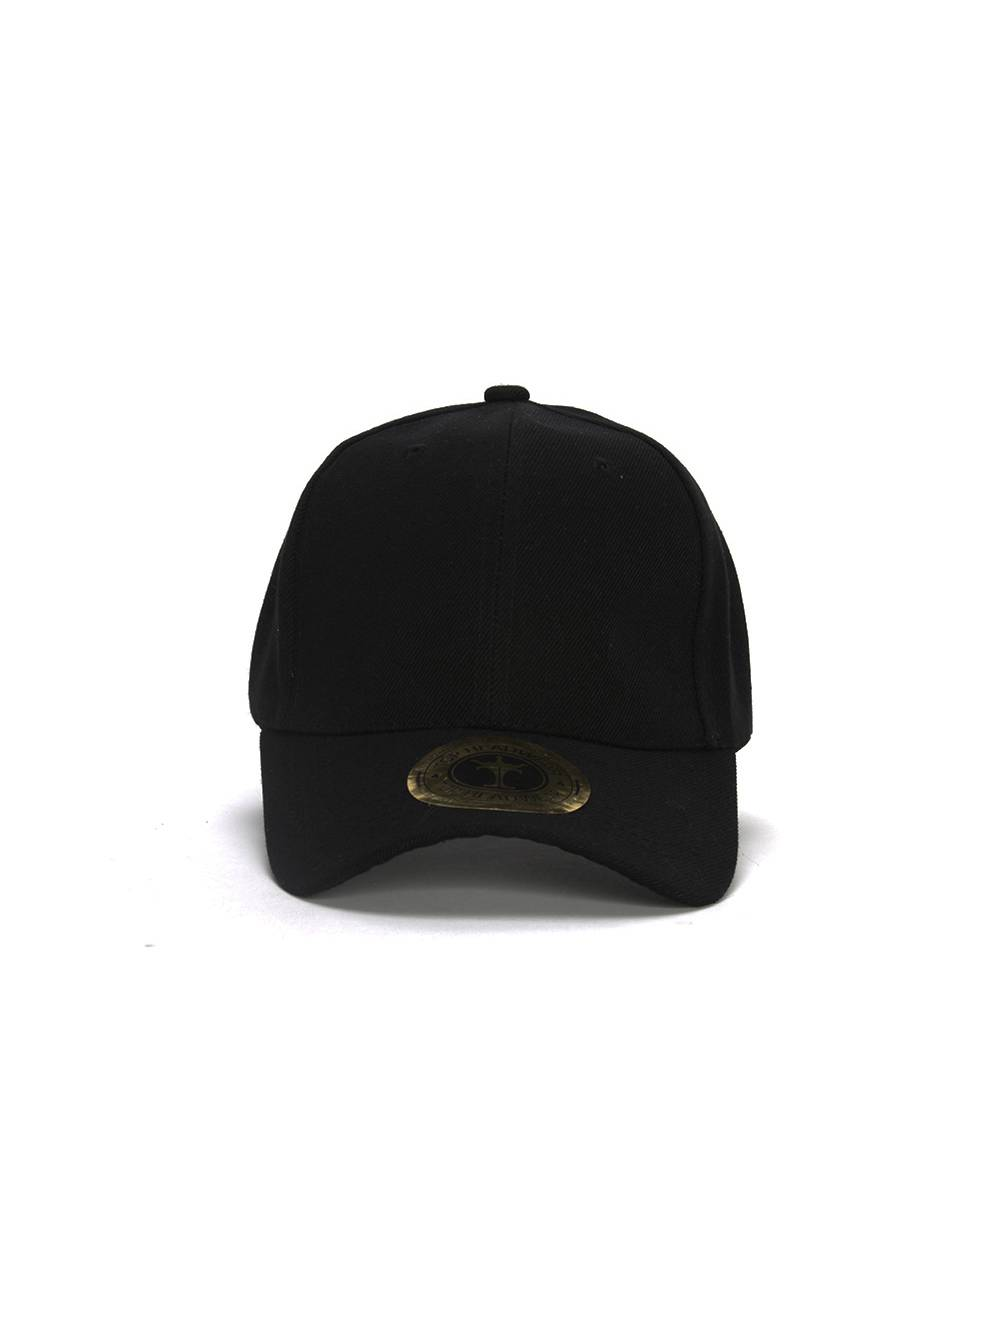 Black//Neon Green TopHeadwear Adjustable Trucker Caps